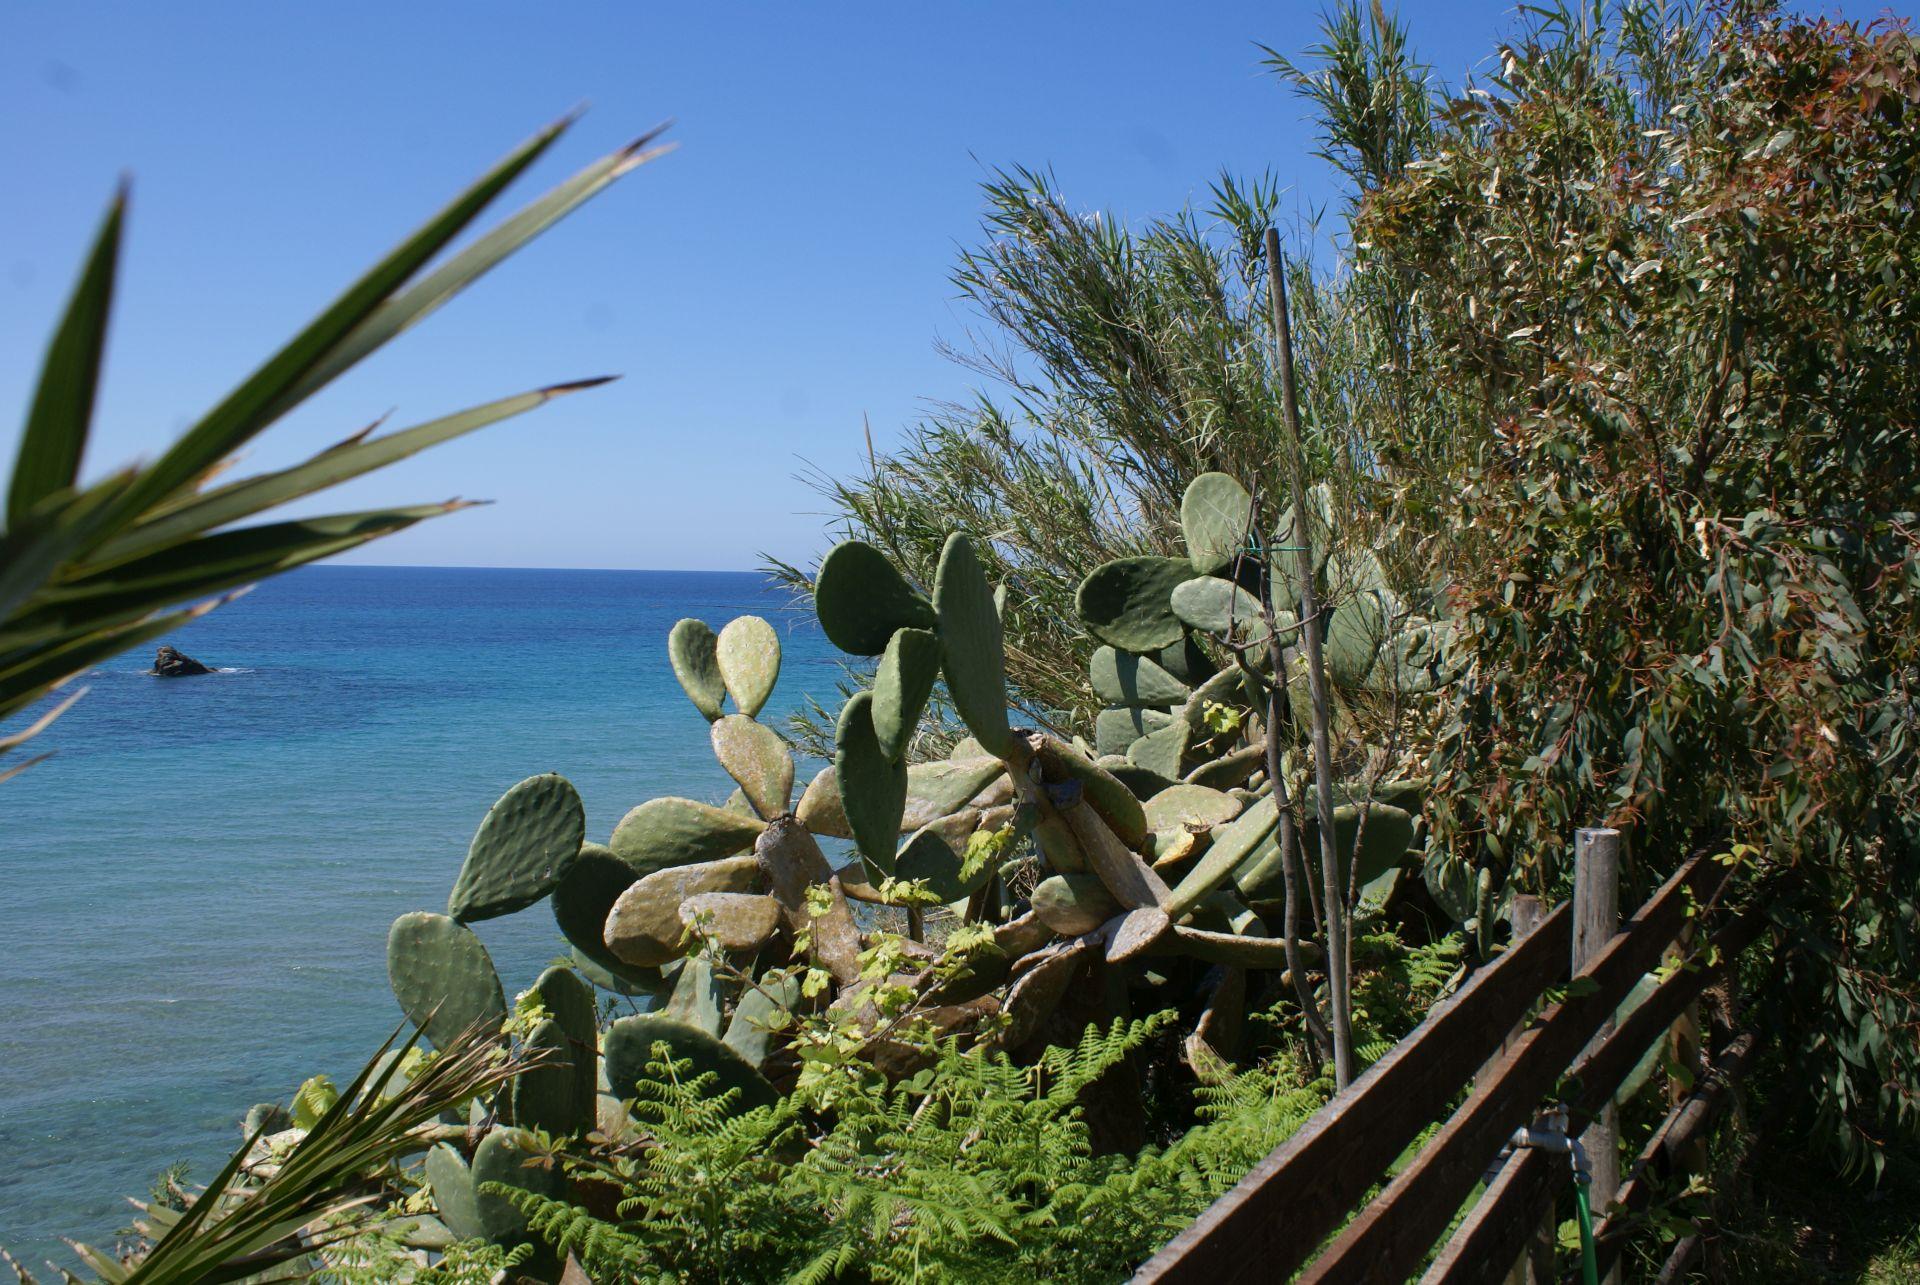 Blick auf das Meer - Korfu Strandvilla Meliti, Kanouli, Agios Matheos, Korfu, KorfuCorfu